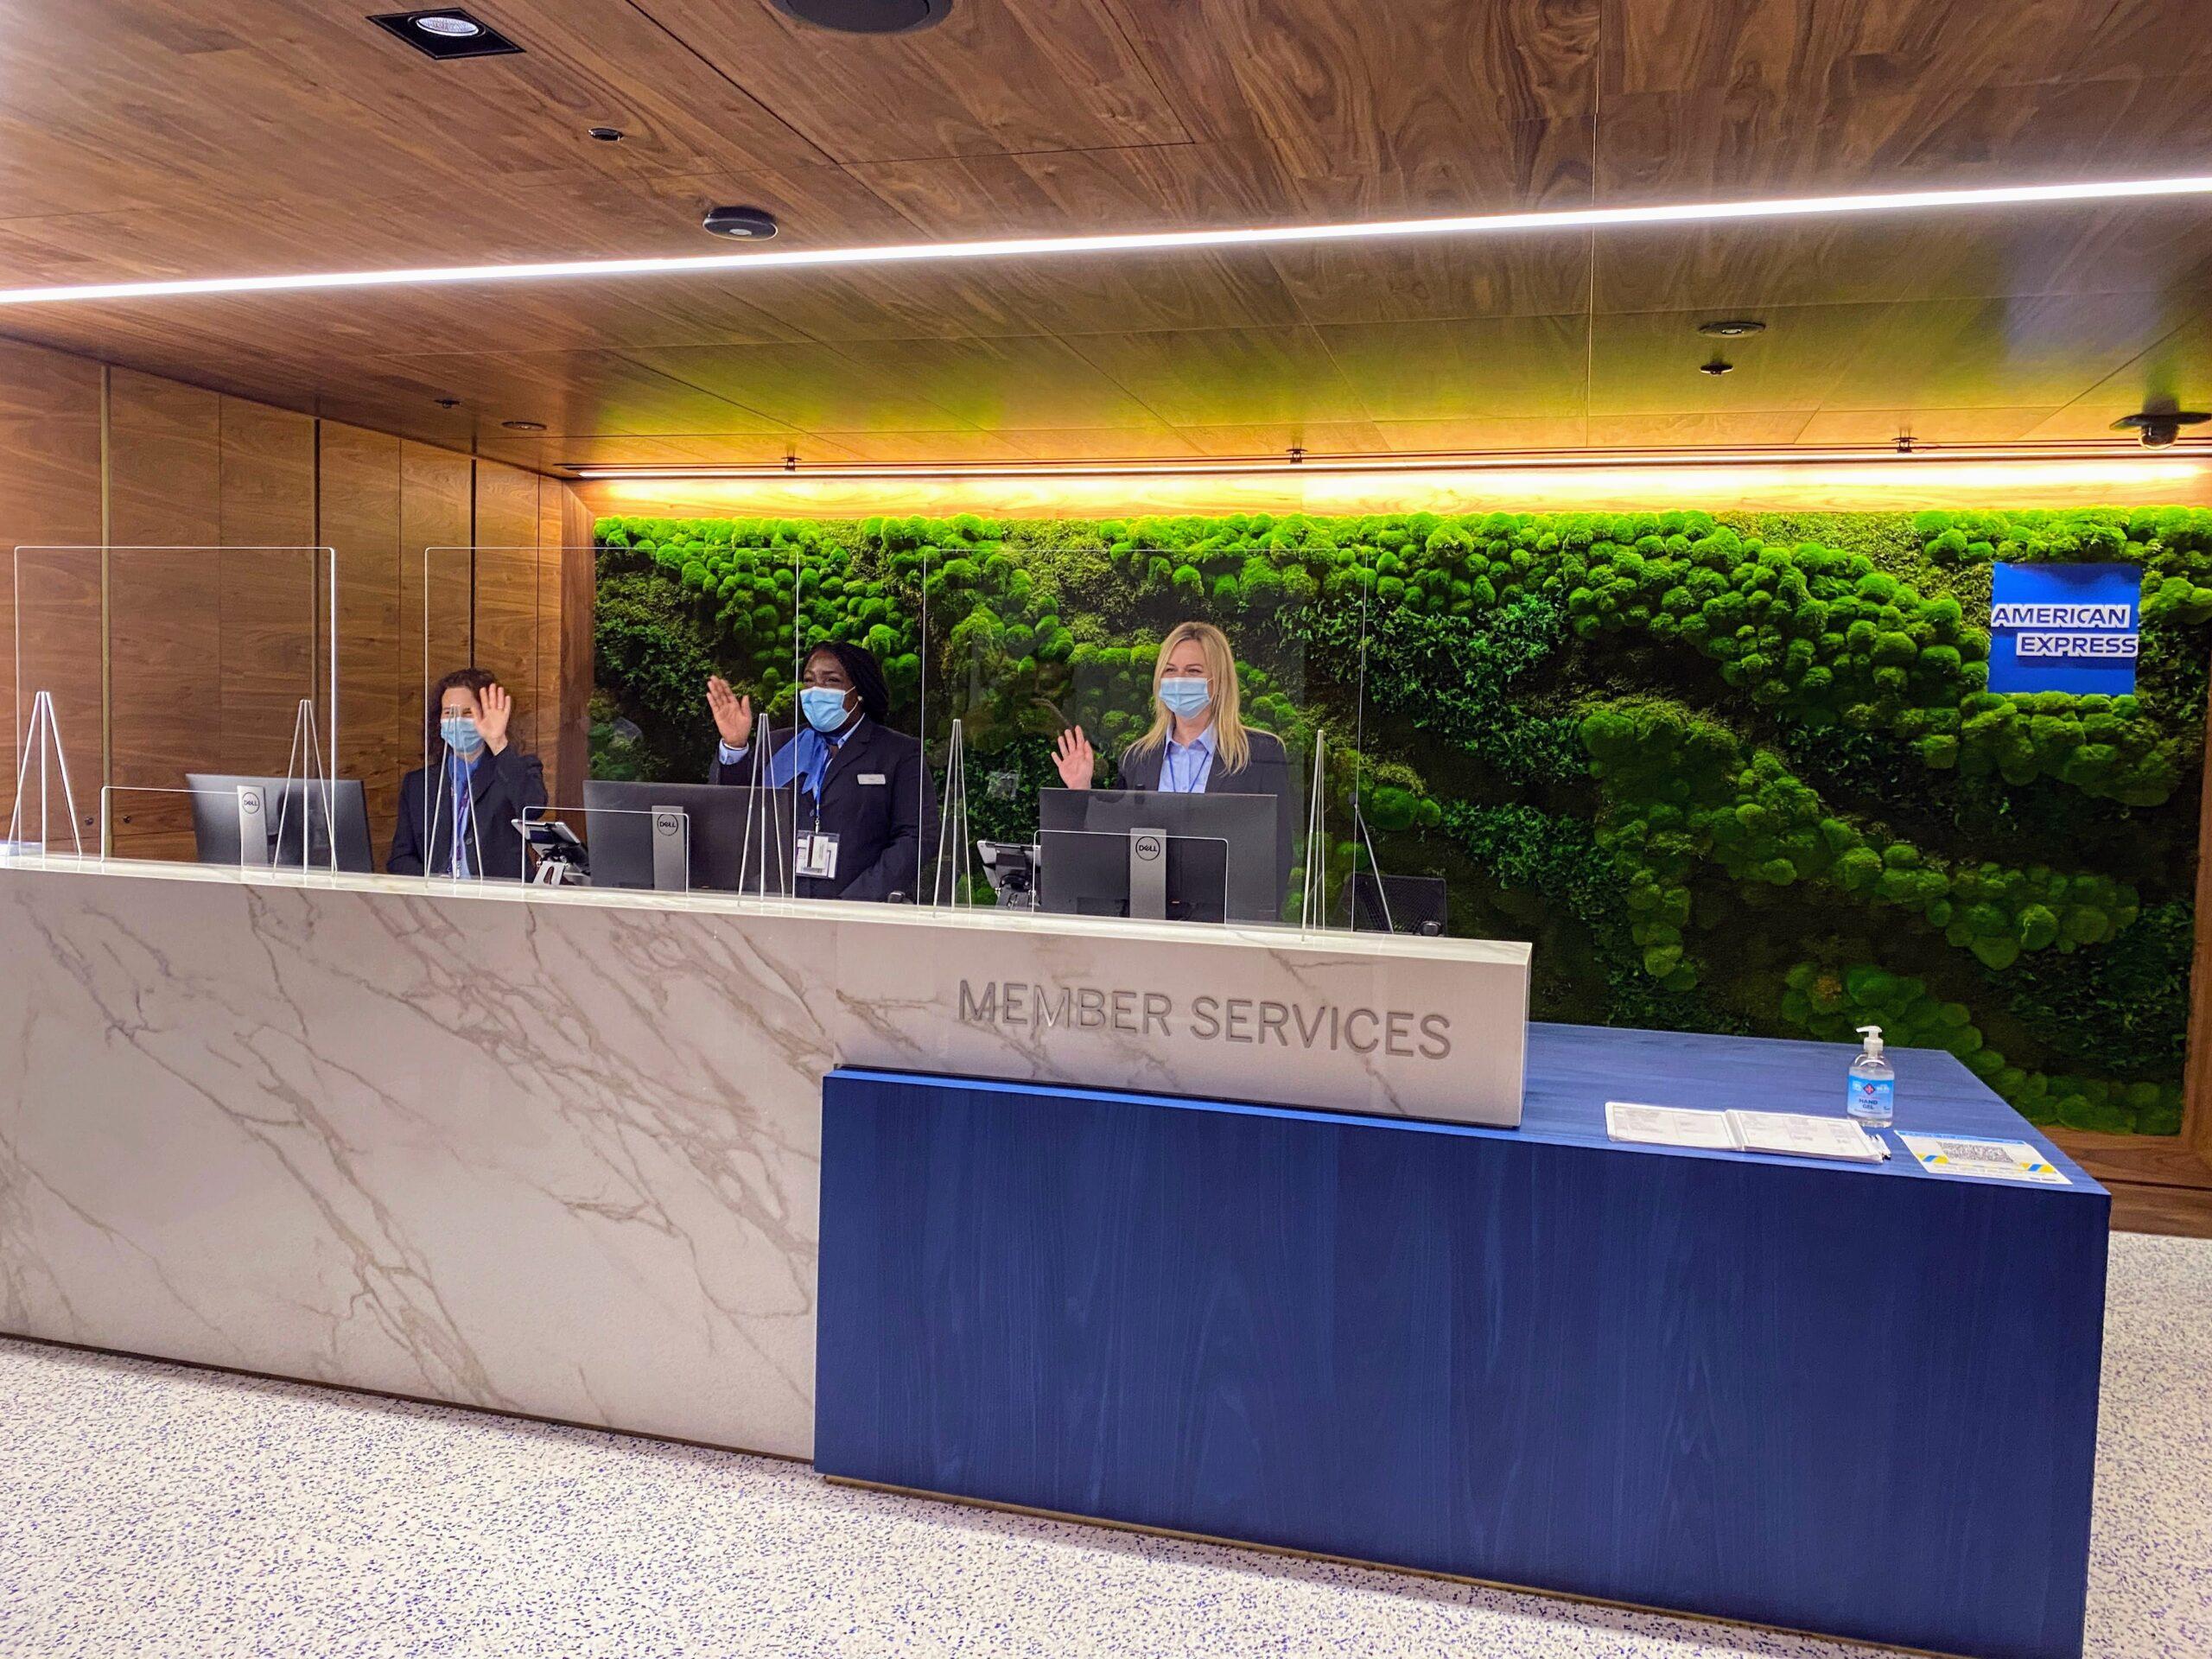 American Express New Centurion Lounge at London Heathrow T3 reception desk